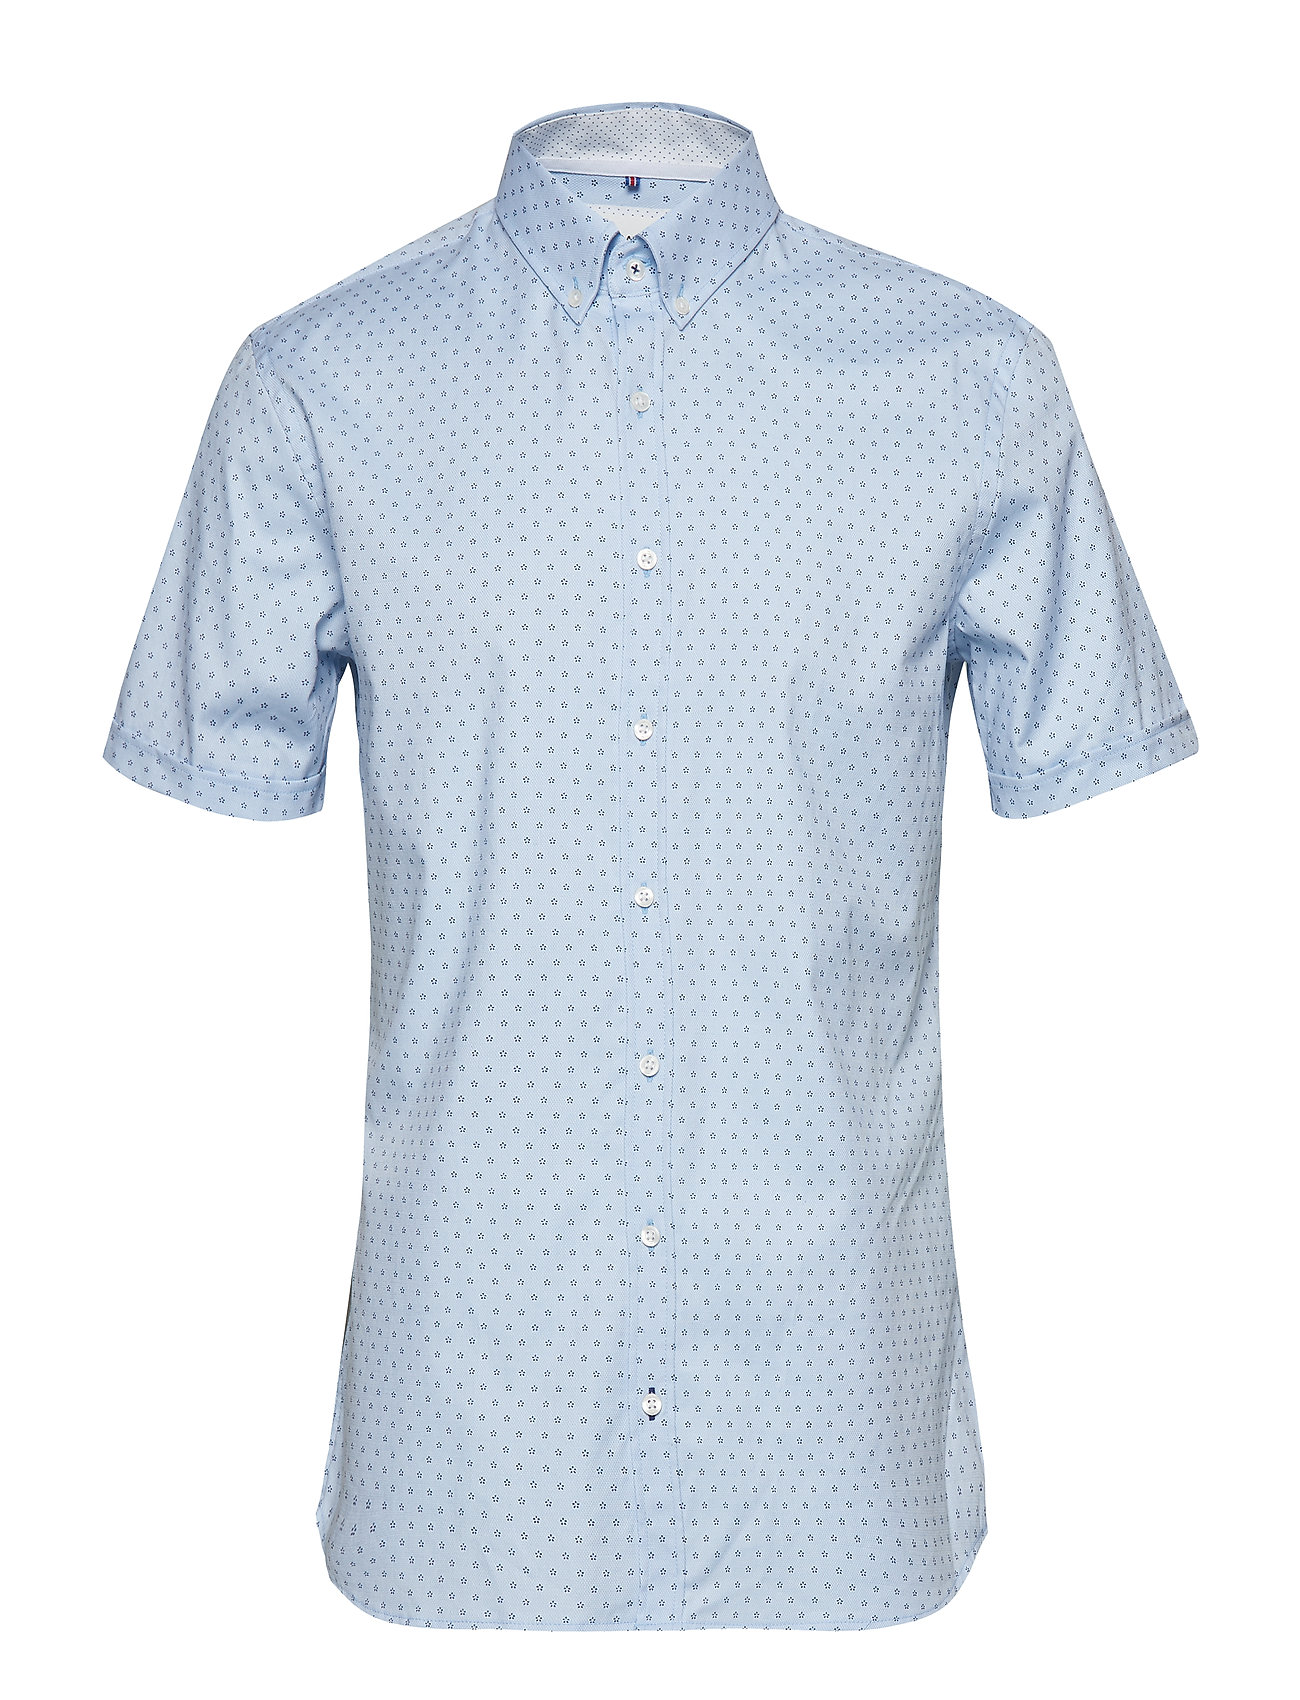 BRAX Style Dan Skjorter Herrer Mørkeblå Tøj Outlet